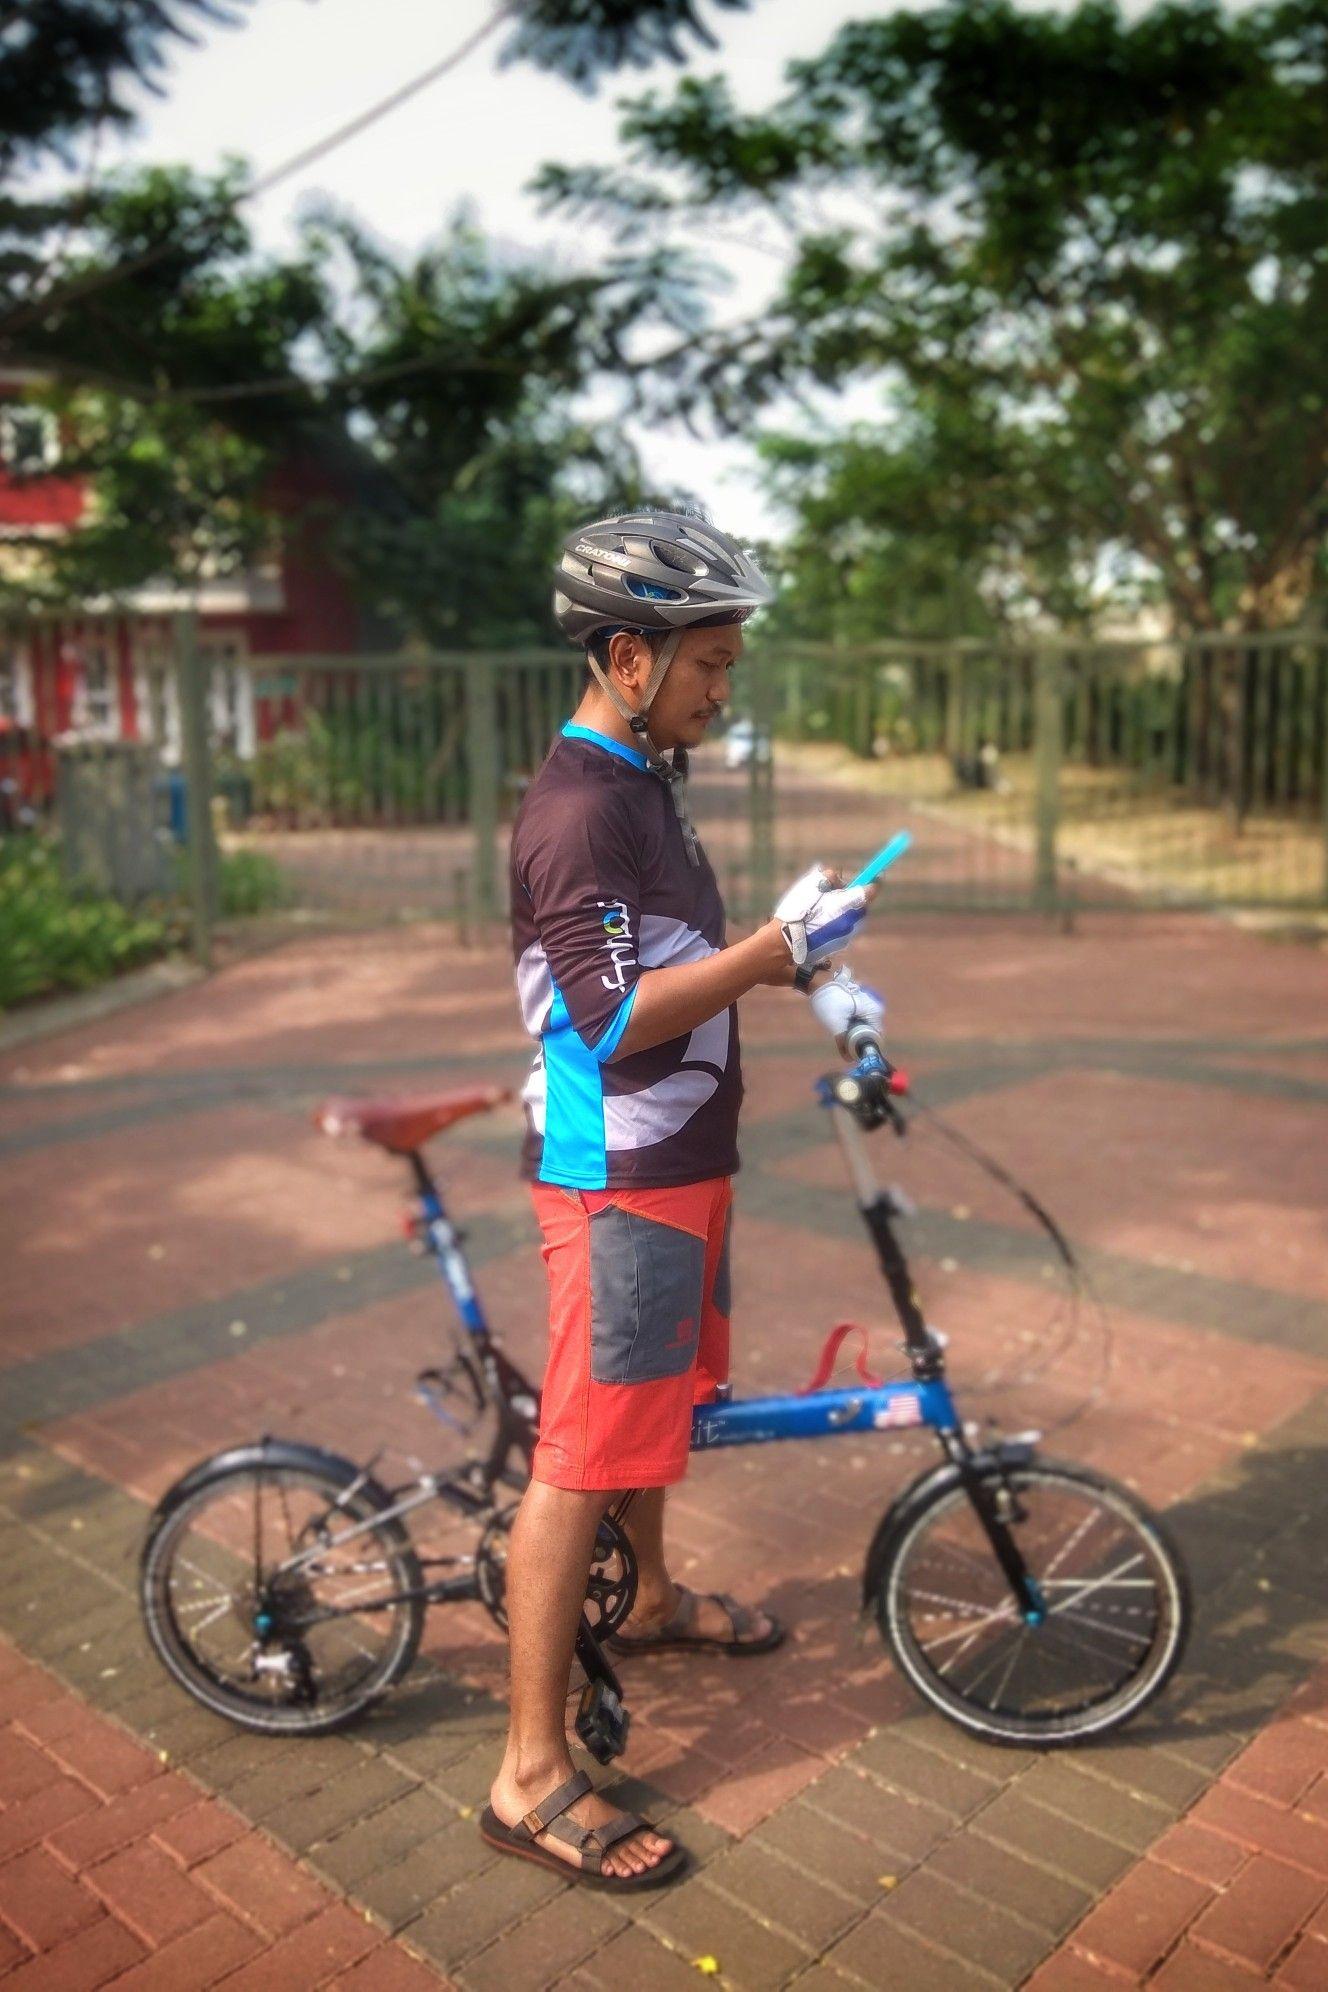 Pin Oleh Wijoe Wijanarko Di Bike Friday Tikit